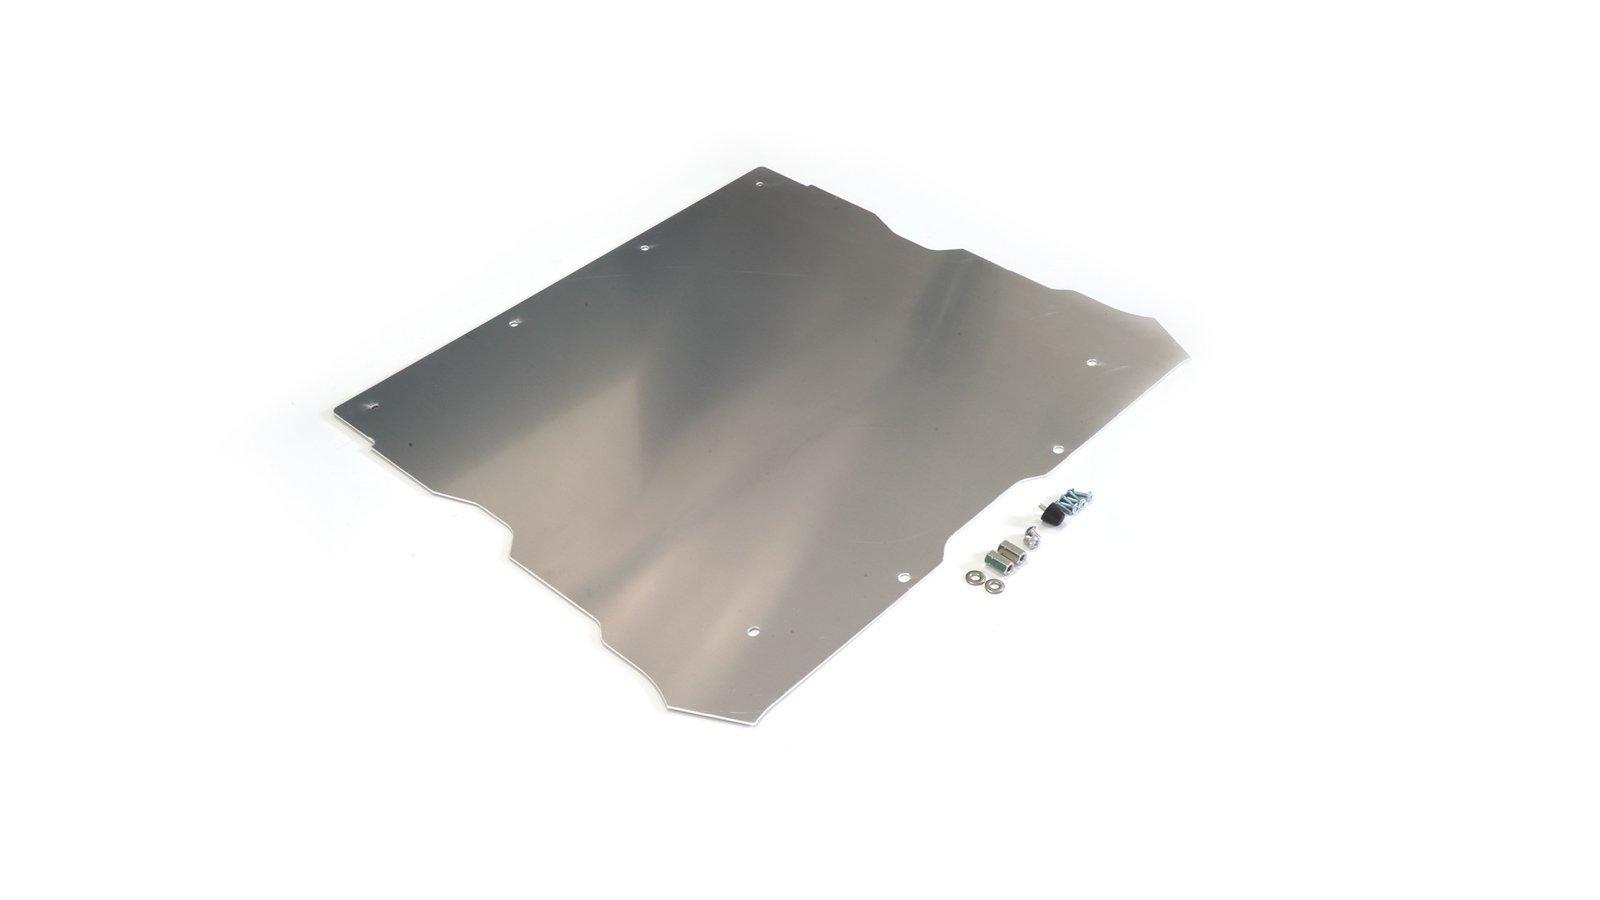 Front Skid Plate Installation